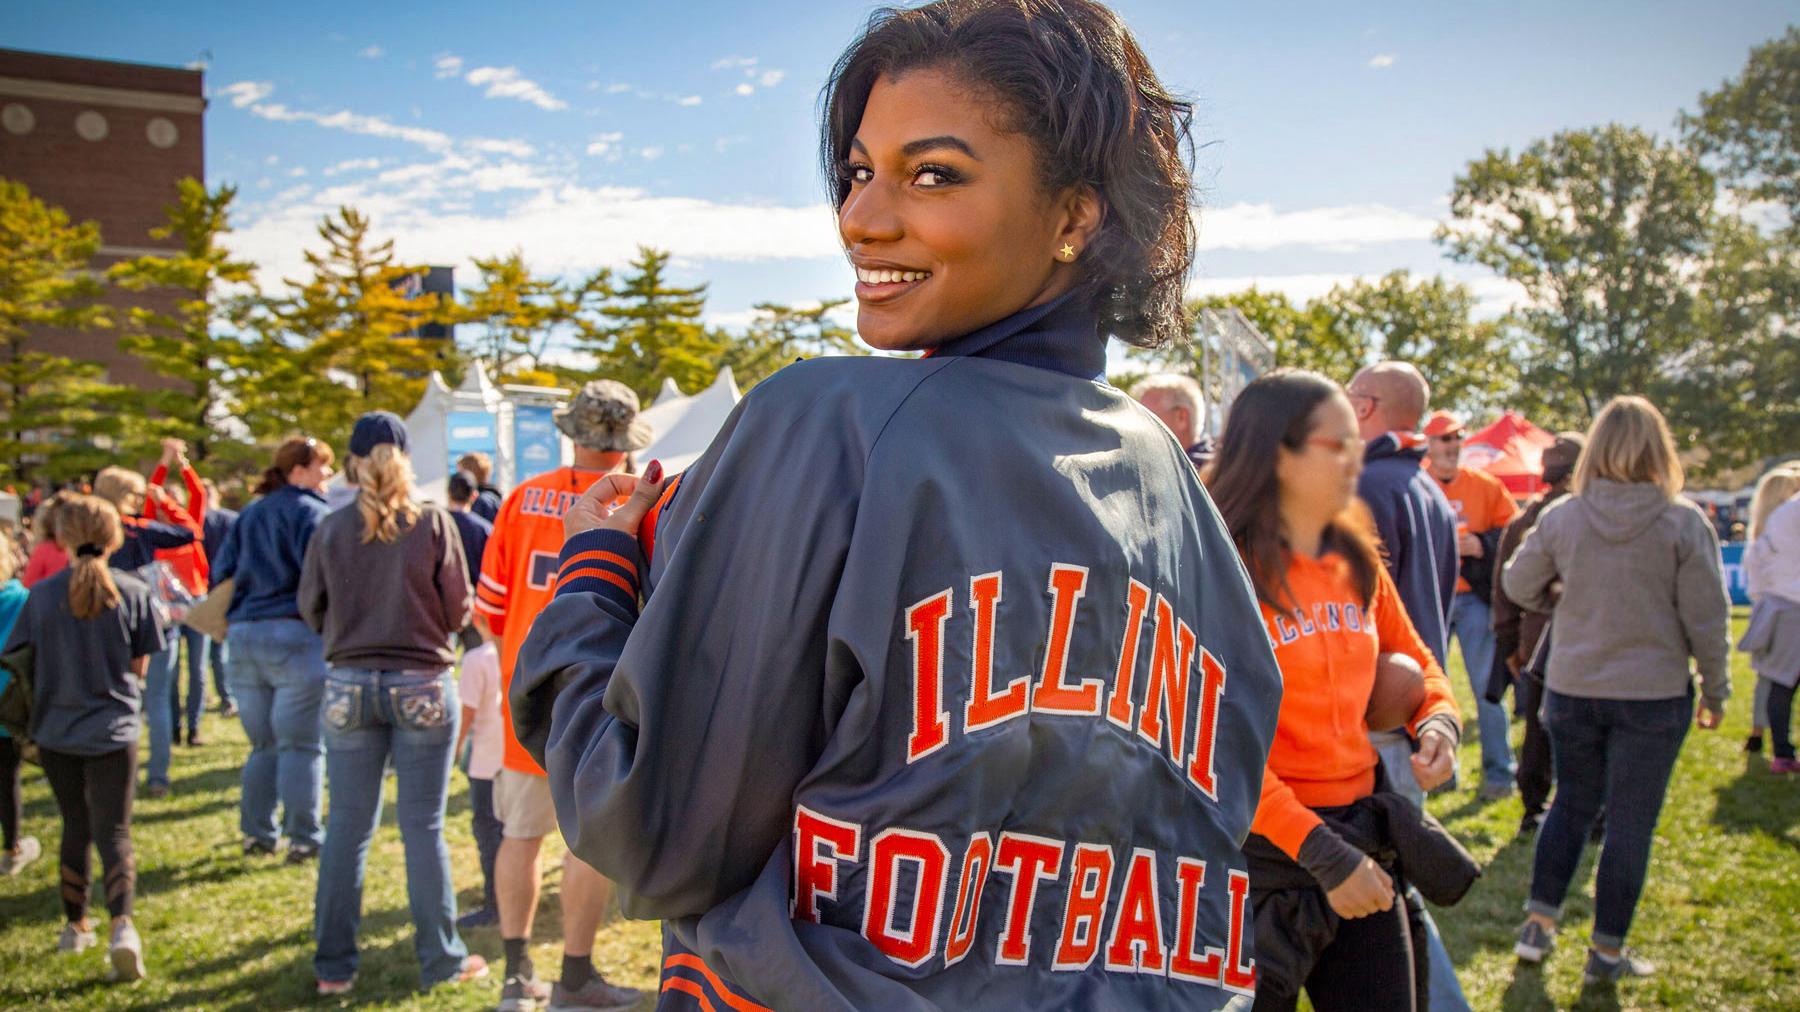 Taylor Rooks, wearing an Illini Football jacket, outside Memorial Stadium